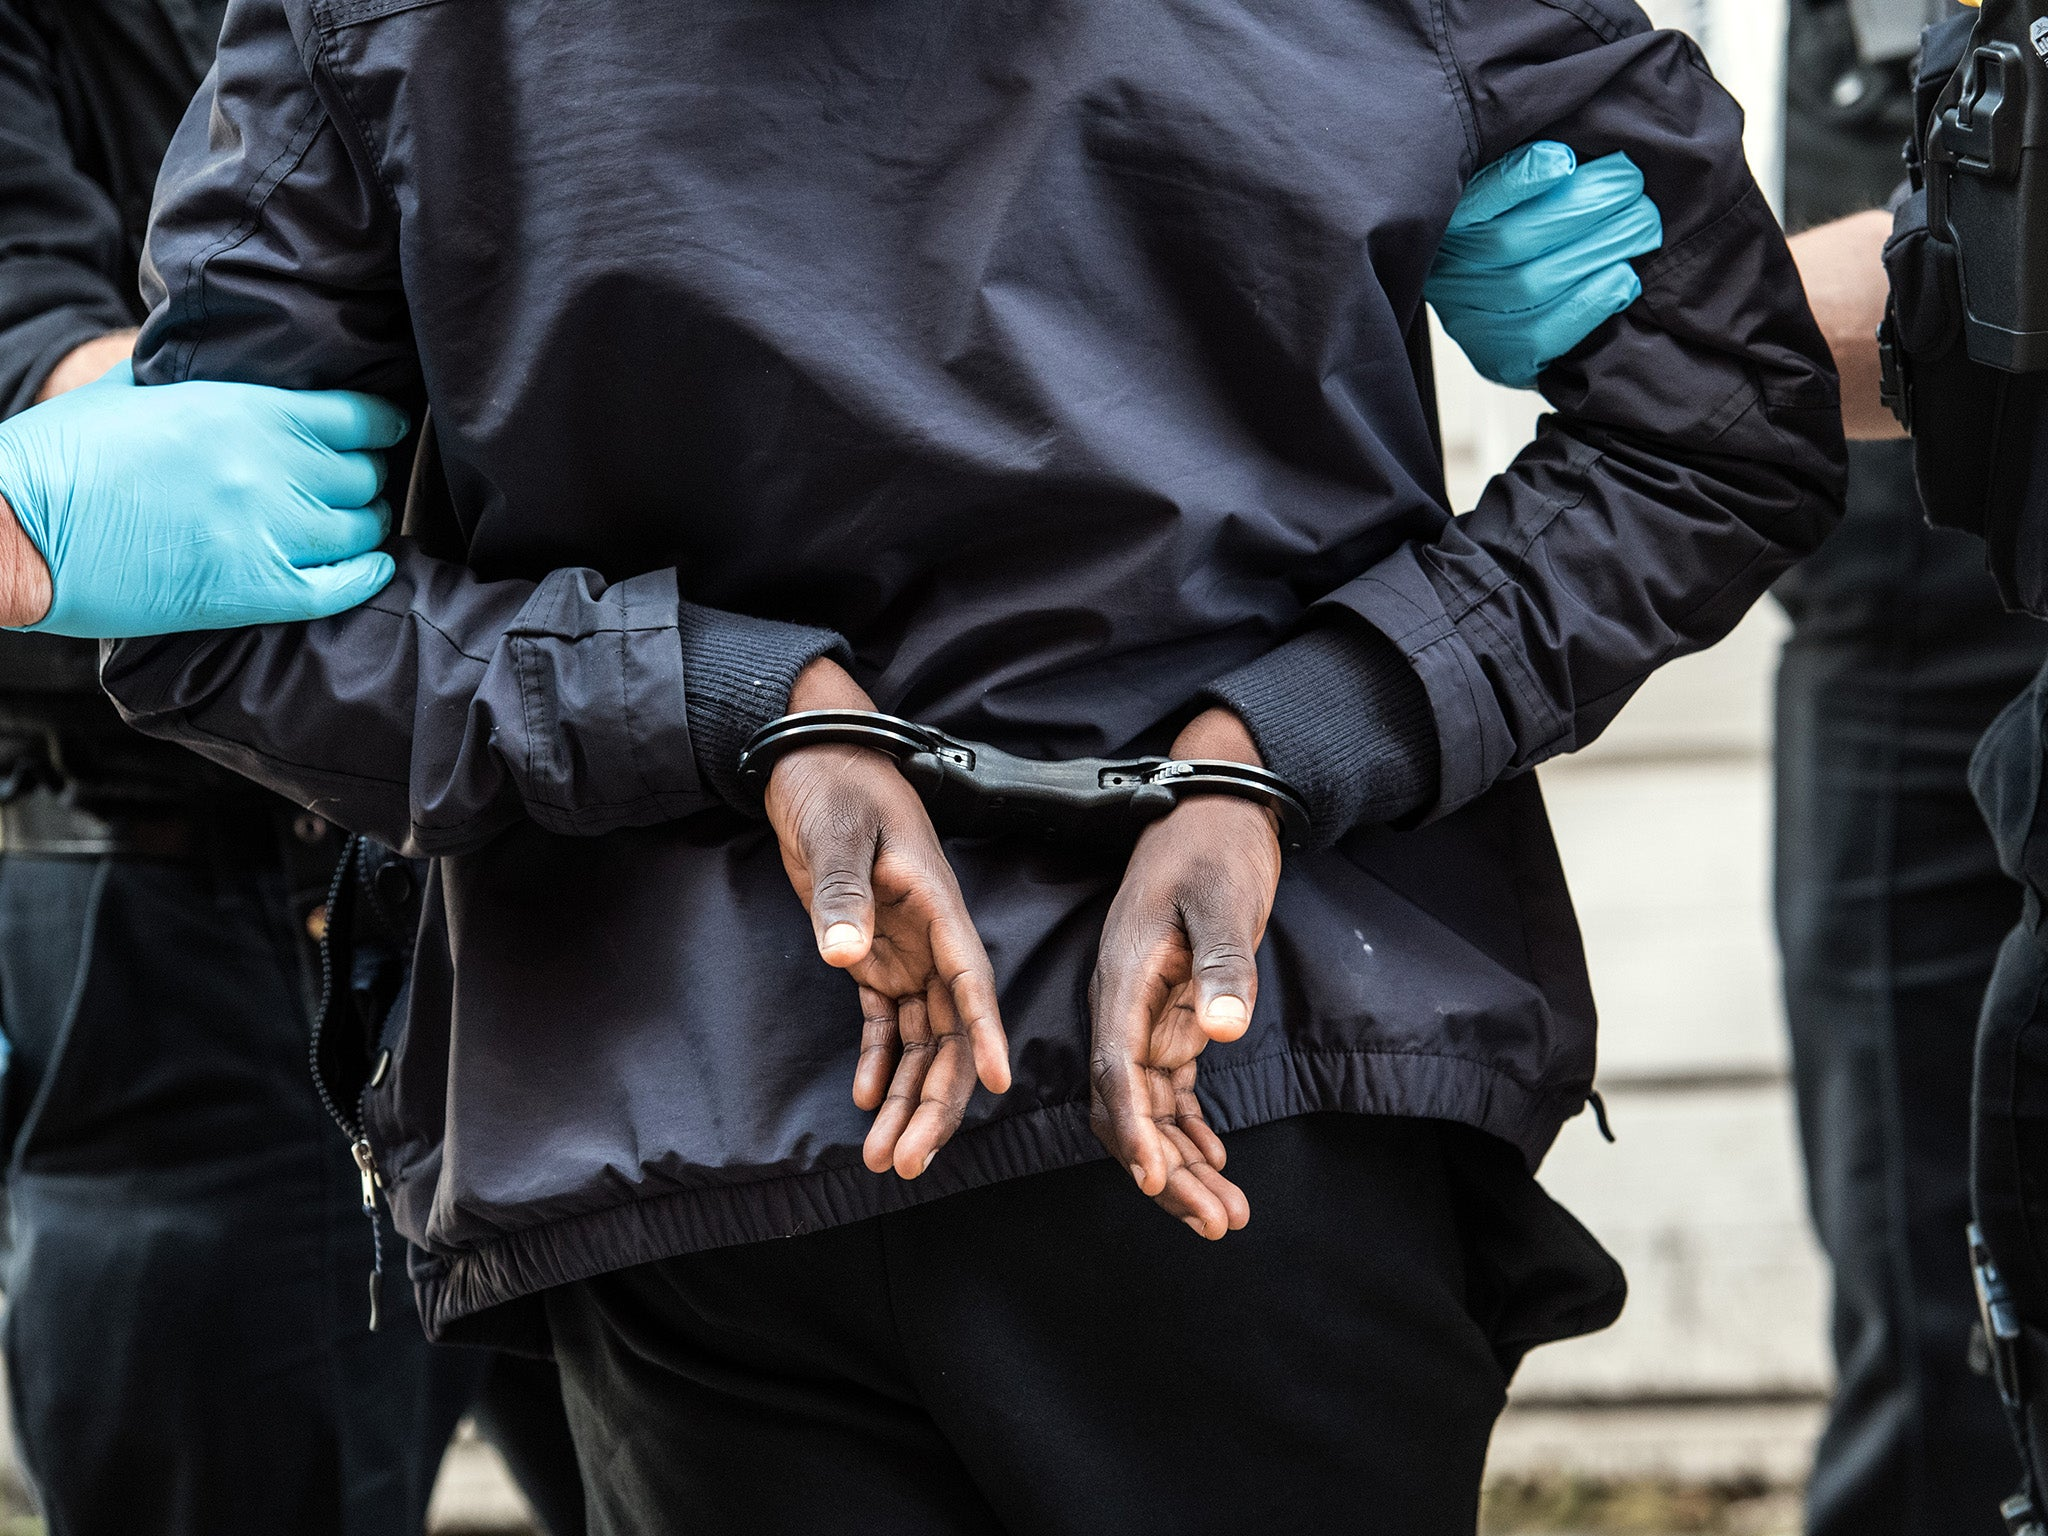 Nigerians arrested in America